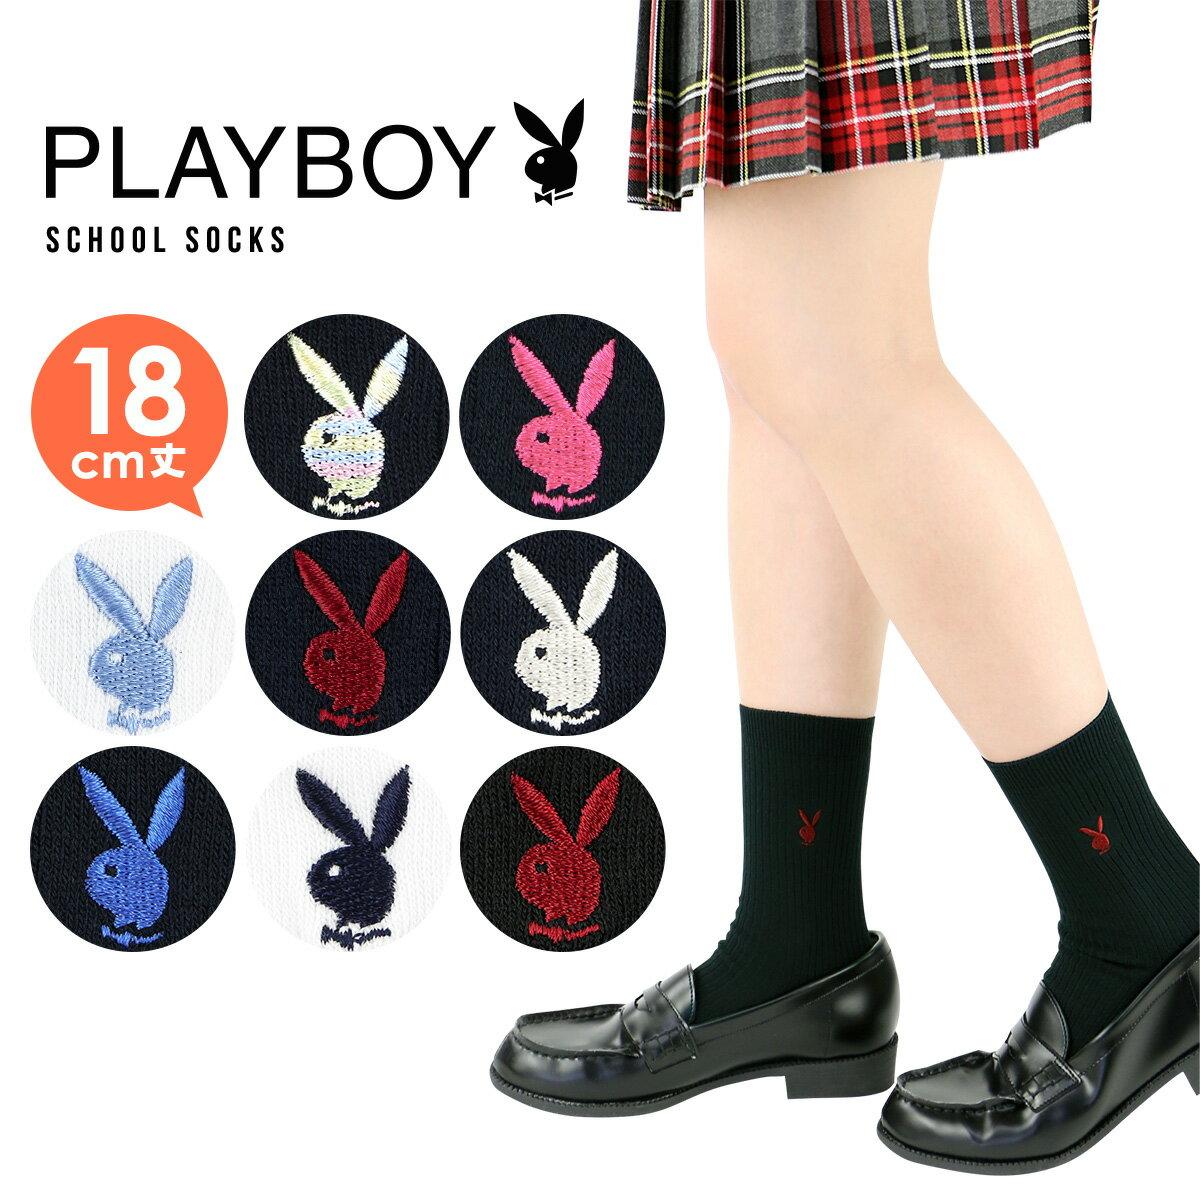 PLAYBOY (プレイボーイ) スクールソックス ワンポイント 両面刺繍 18cm丈 レディス クルーソックス 靴下 3737-351ポイント10倍